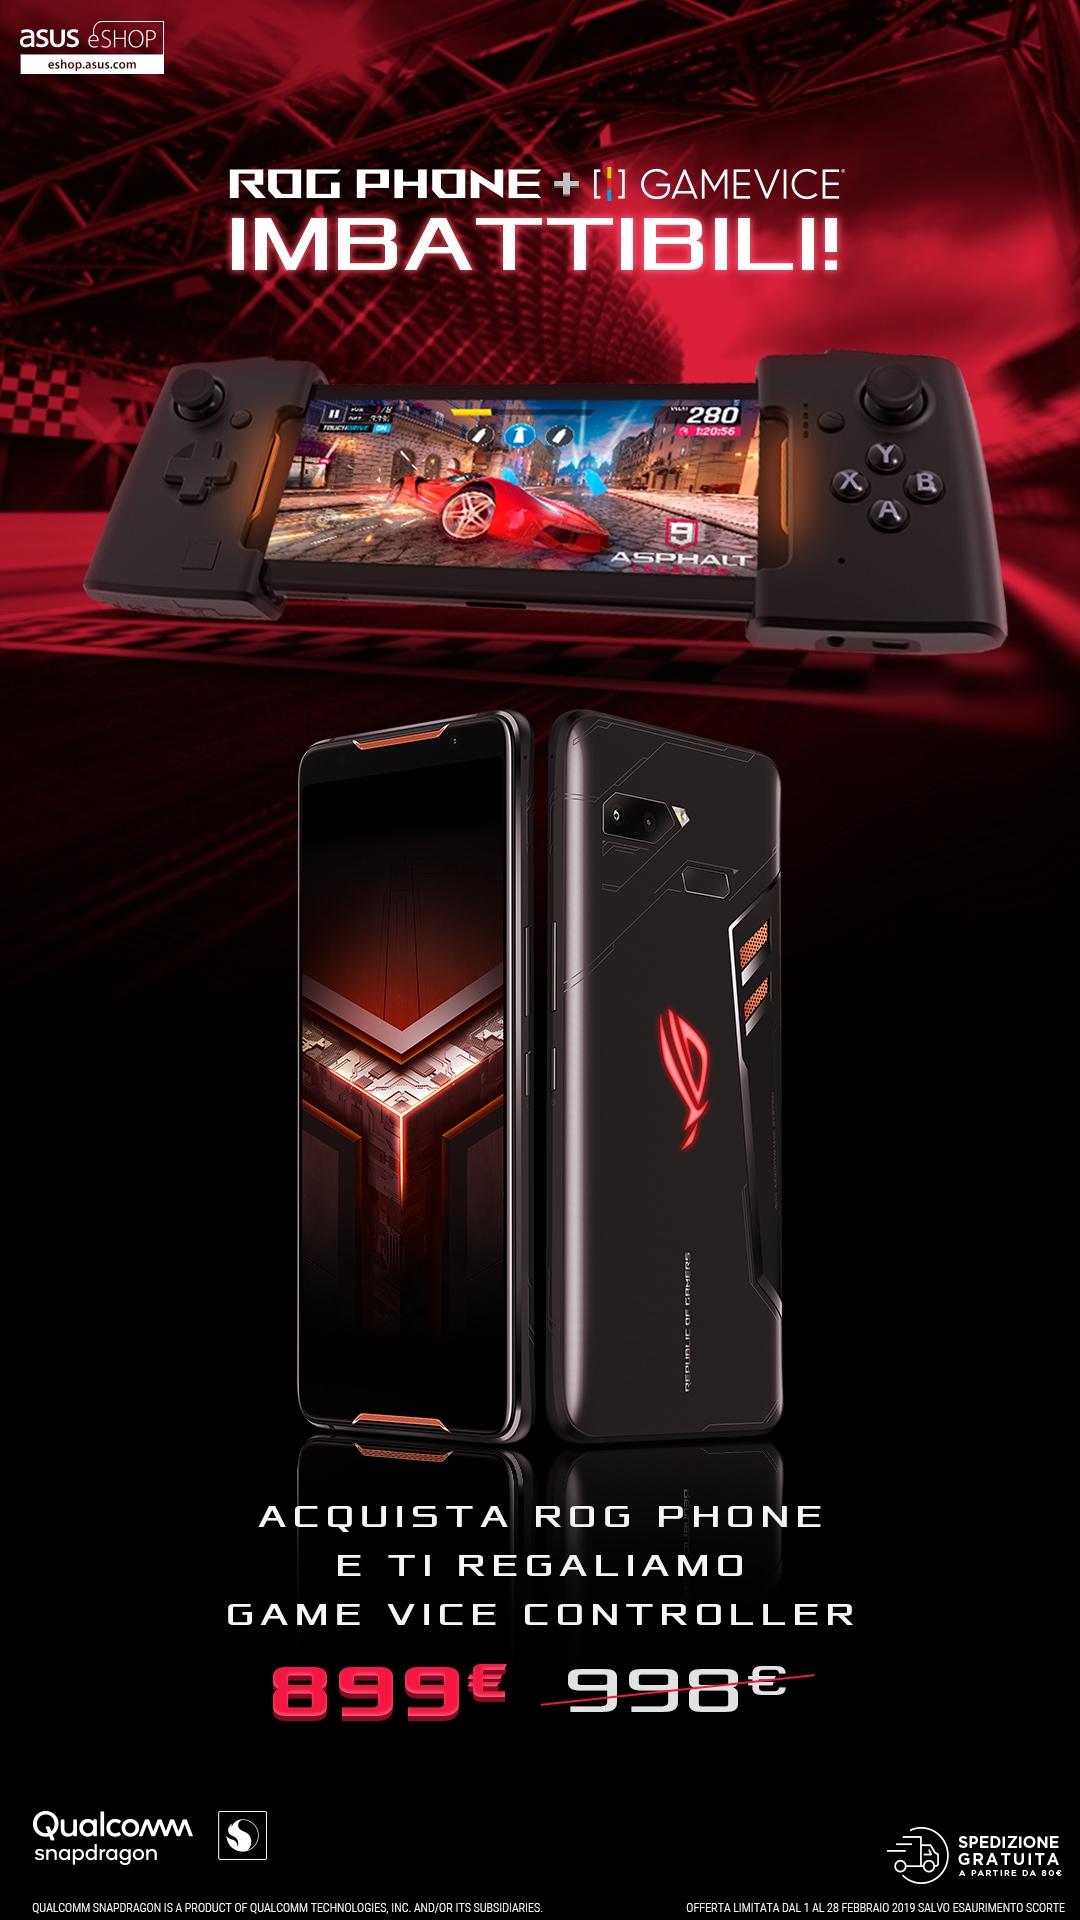 Promo Febbraio ROG Phone + Gamevice